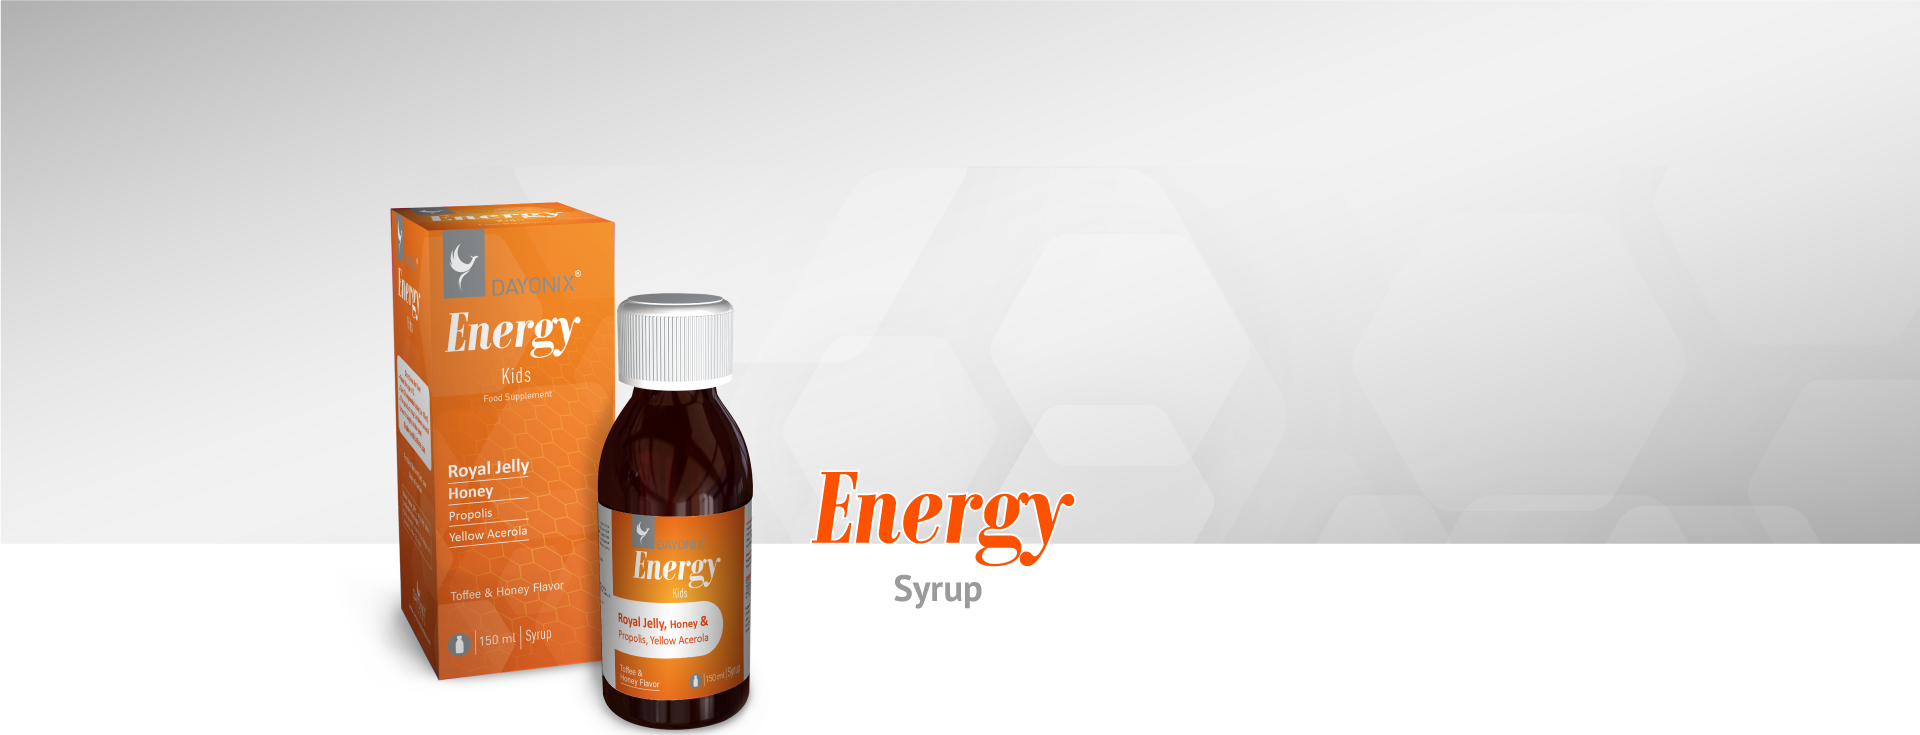 Dayonix Energy Kids Syrup